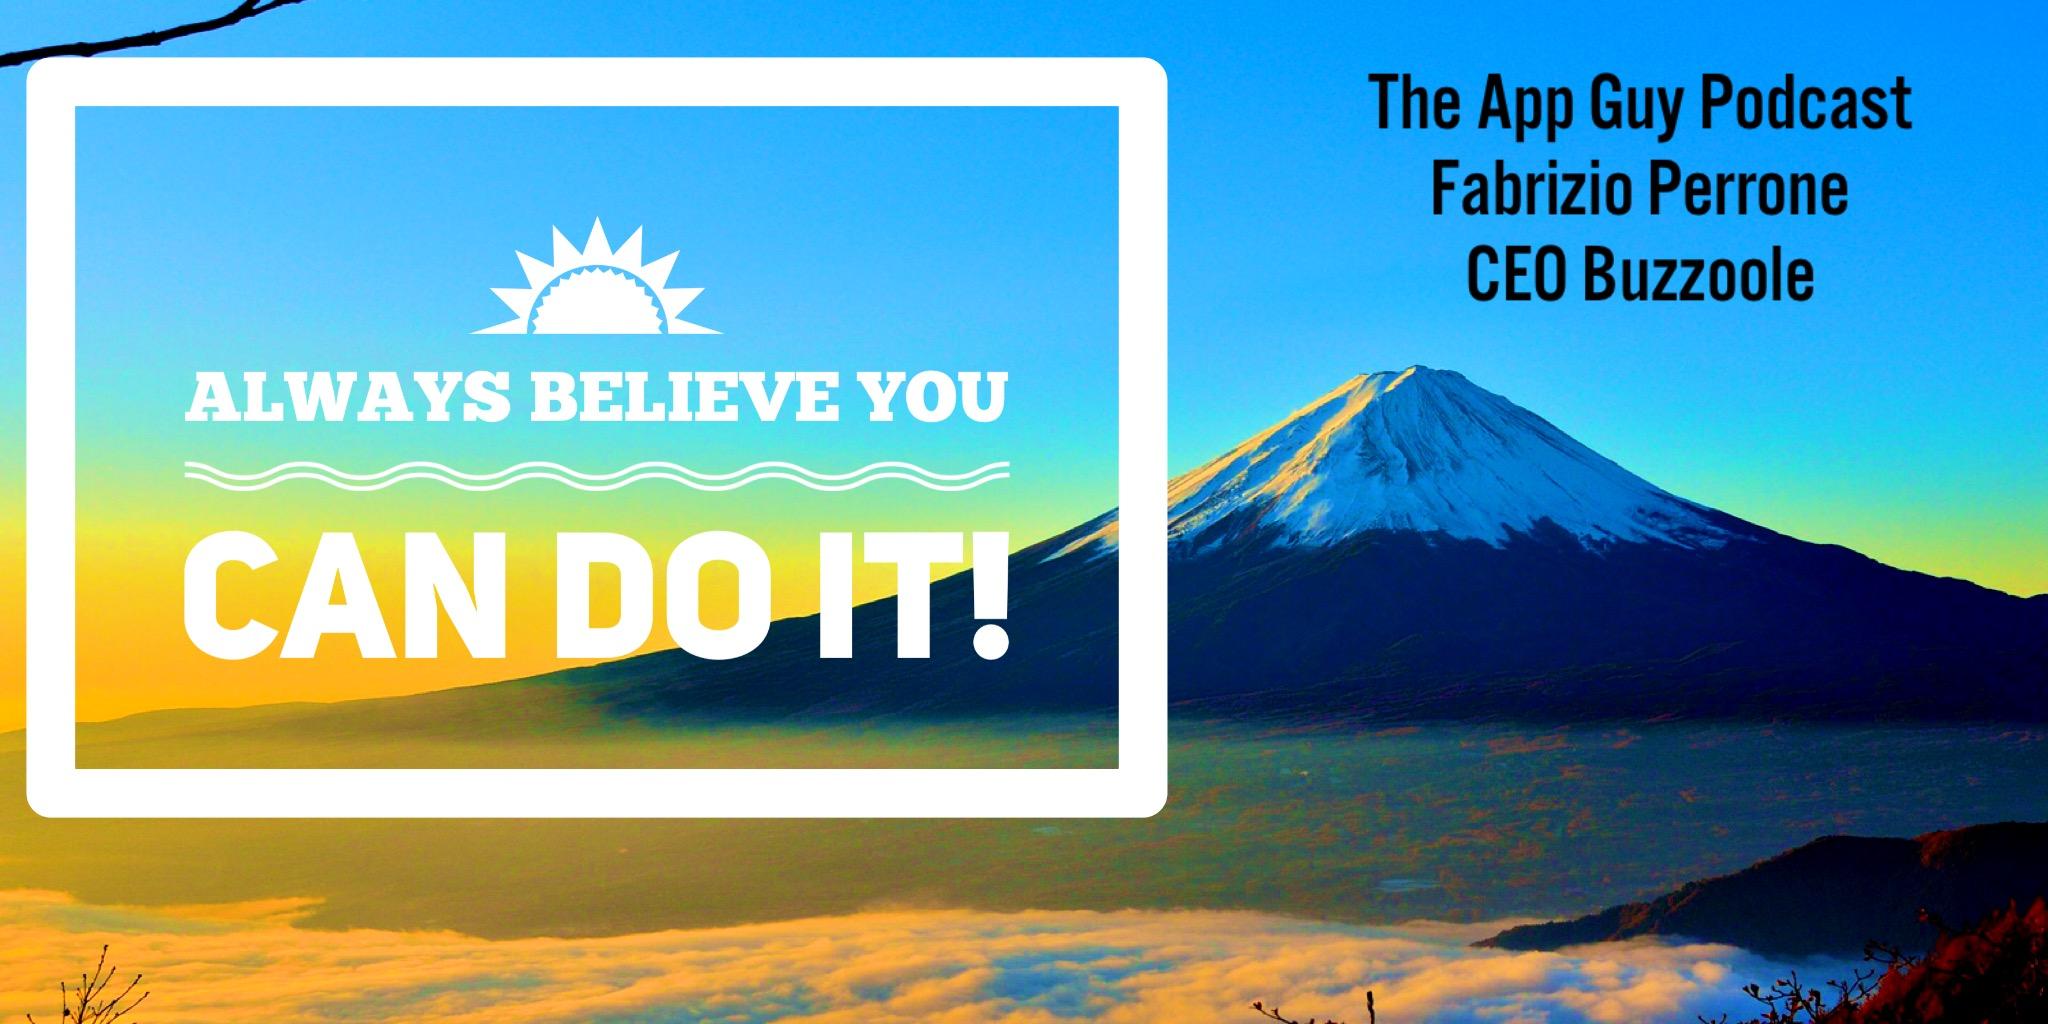 a�?Always believe you can do ita�? - Fabrizio Perrone